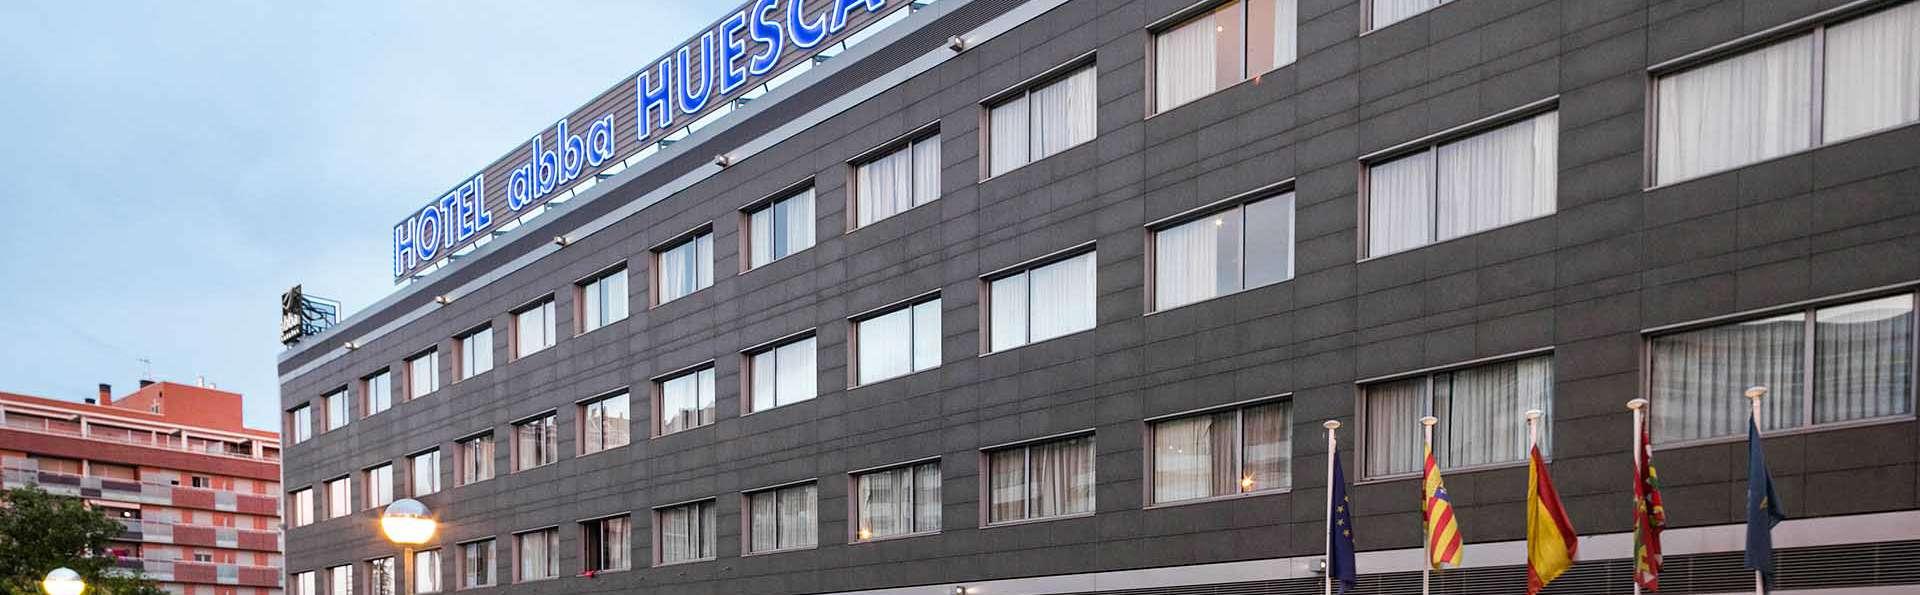 Abba Huesca - EDIT_abba-huesca-hotels_17.jpg